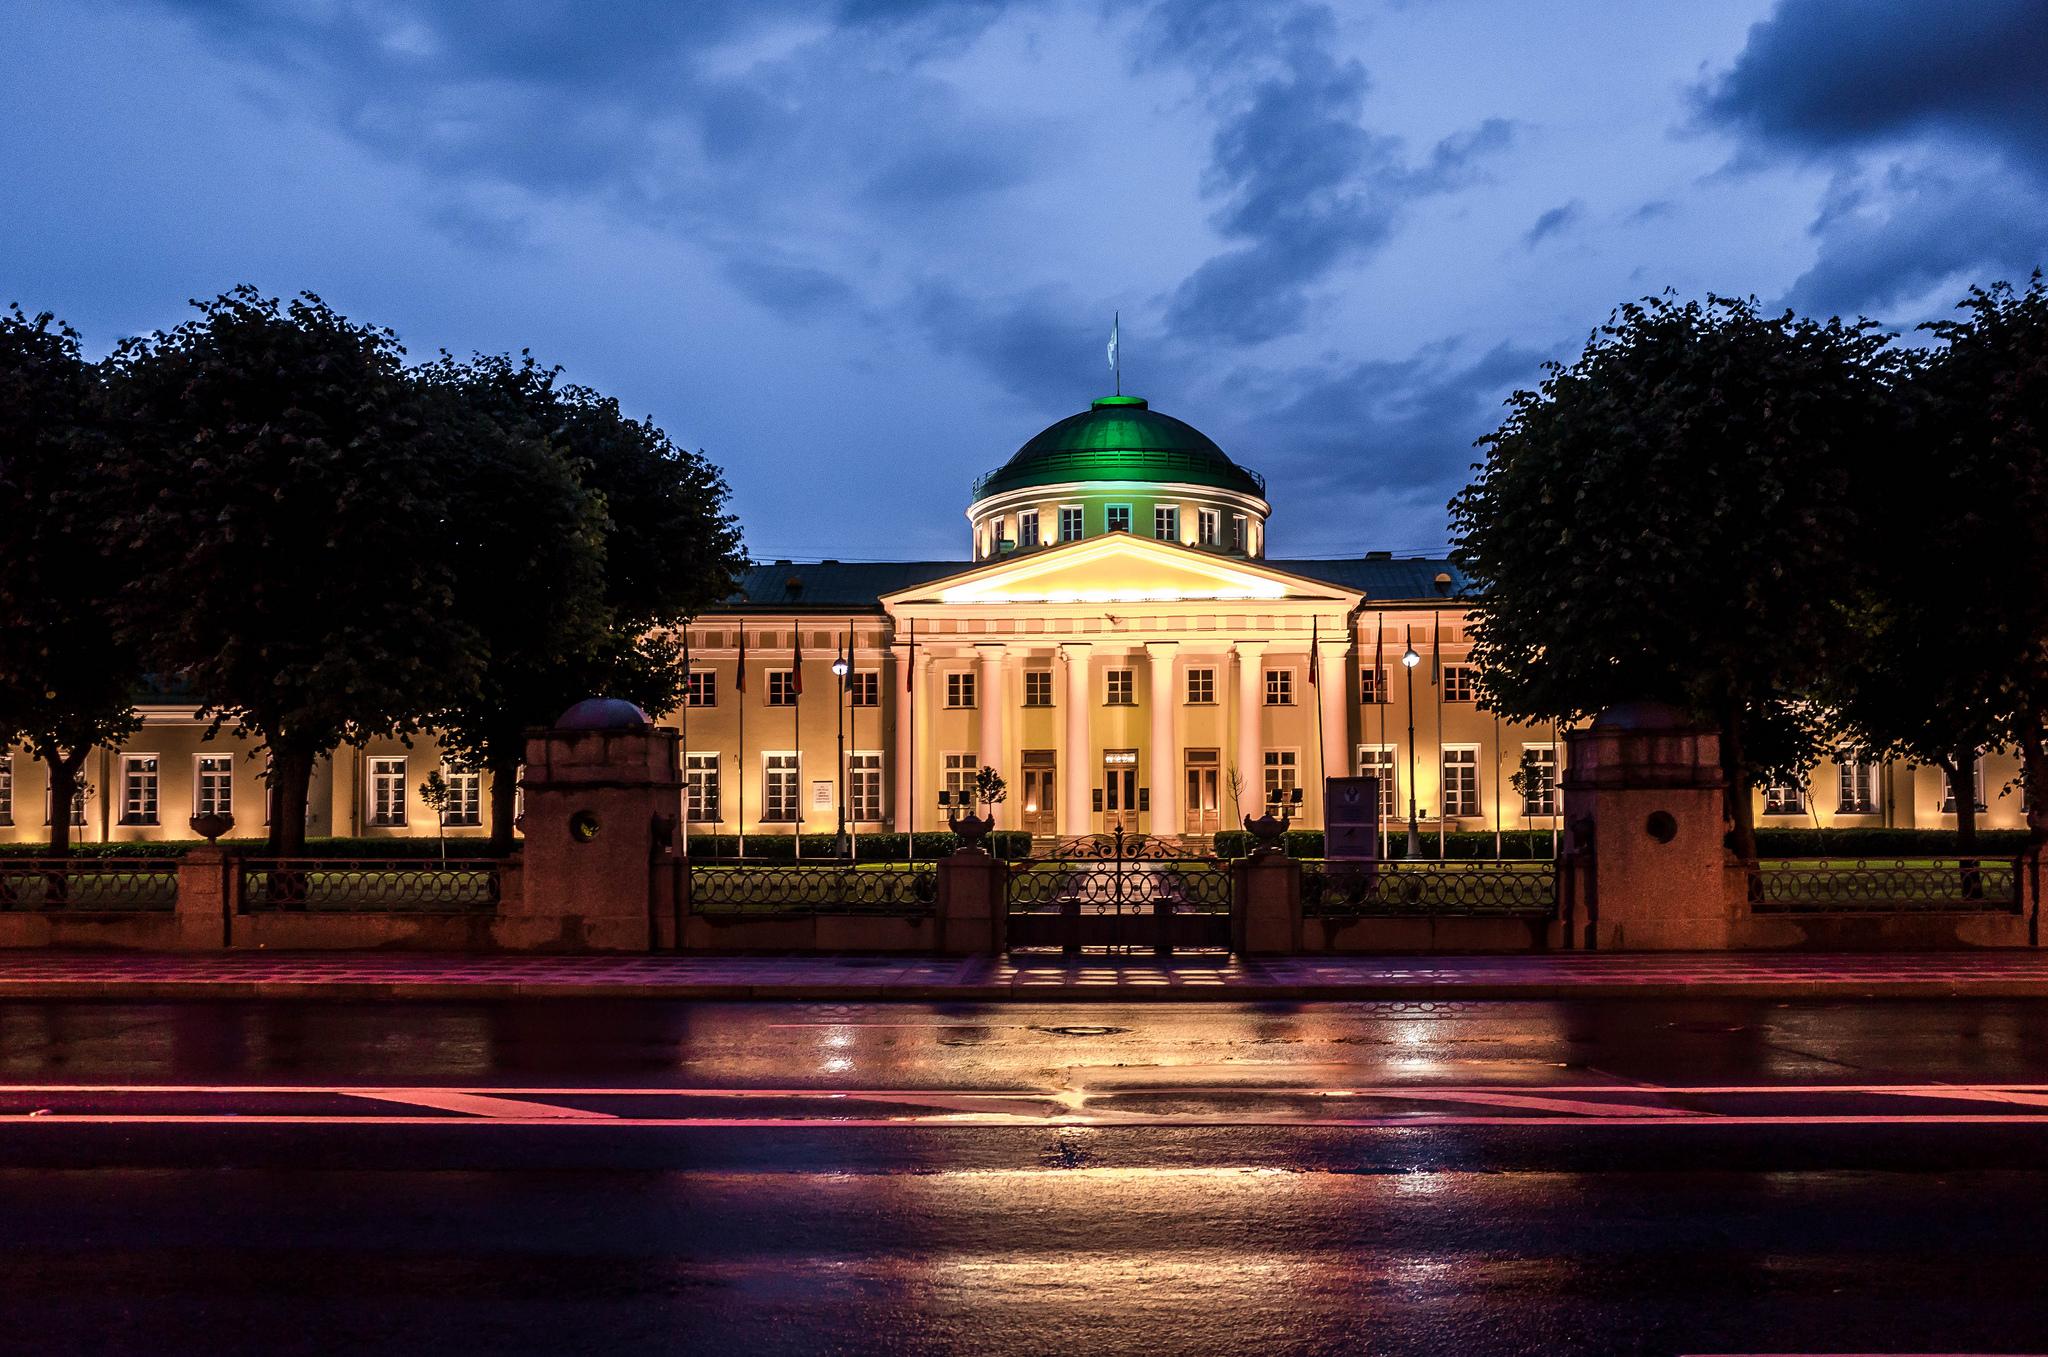 Таврический дворец ночью, Санкт-Петербург